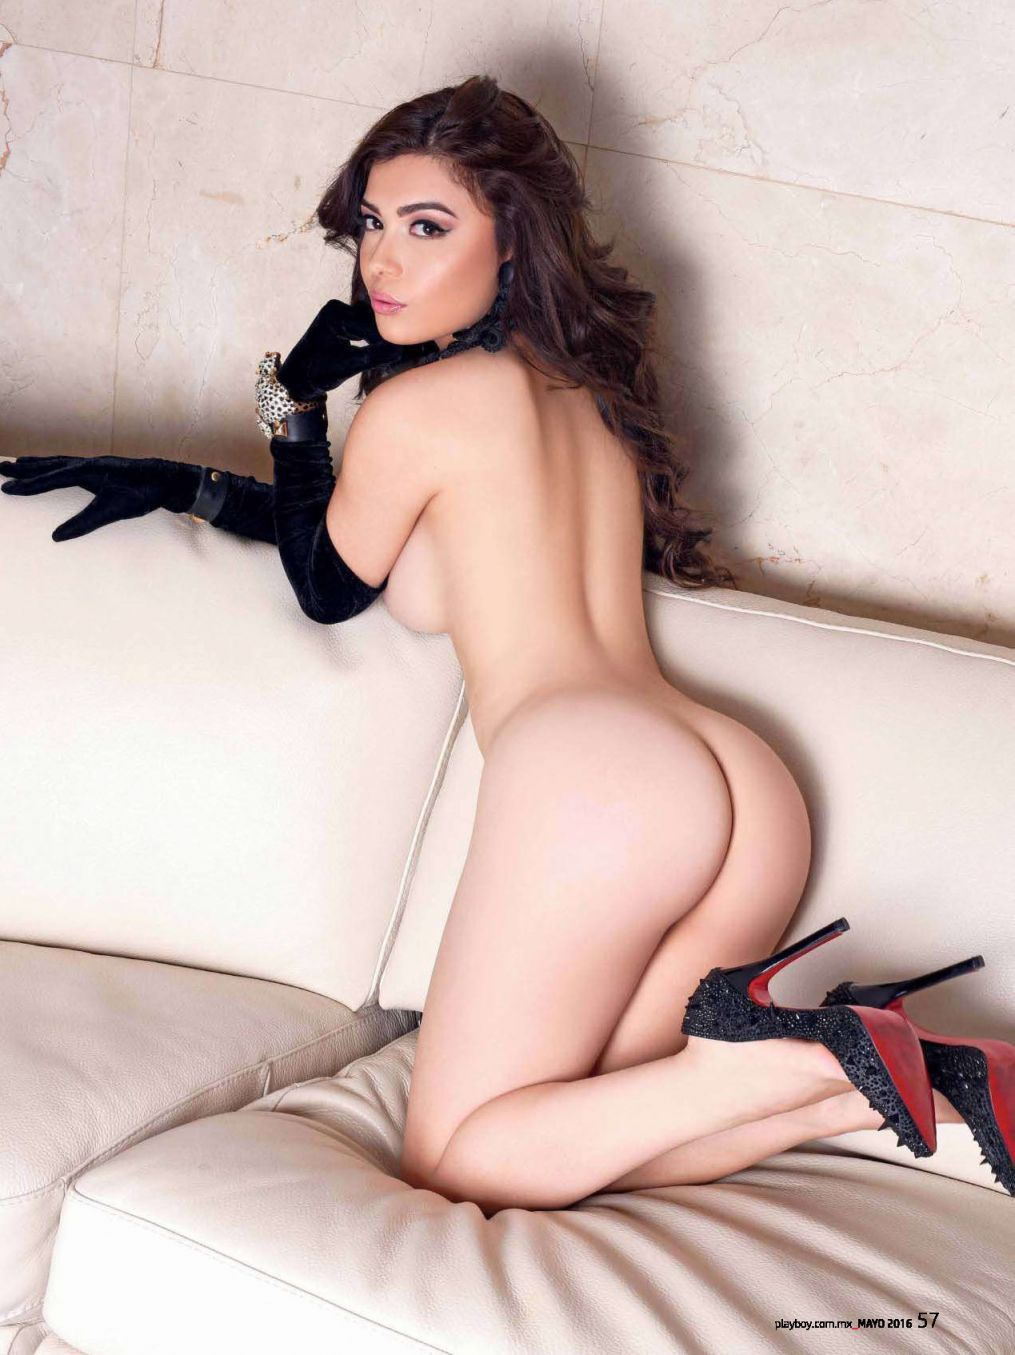 Tracy Saenz nudes (18 photos), Ass, Cleavage, Selfie, in bikini 2020